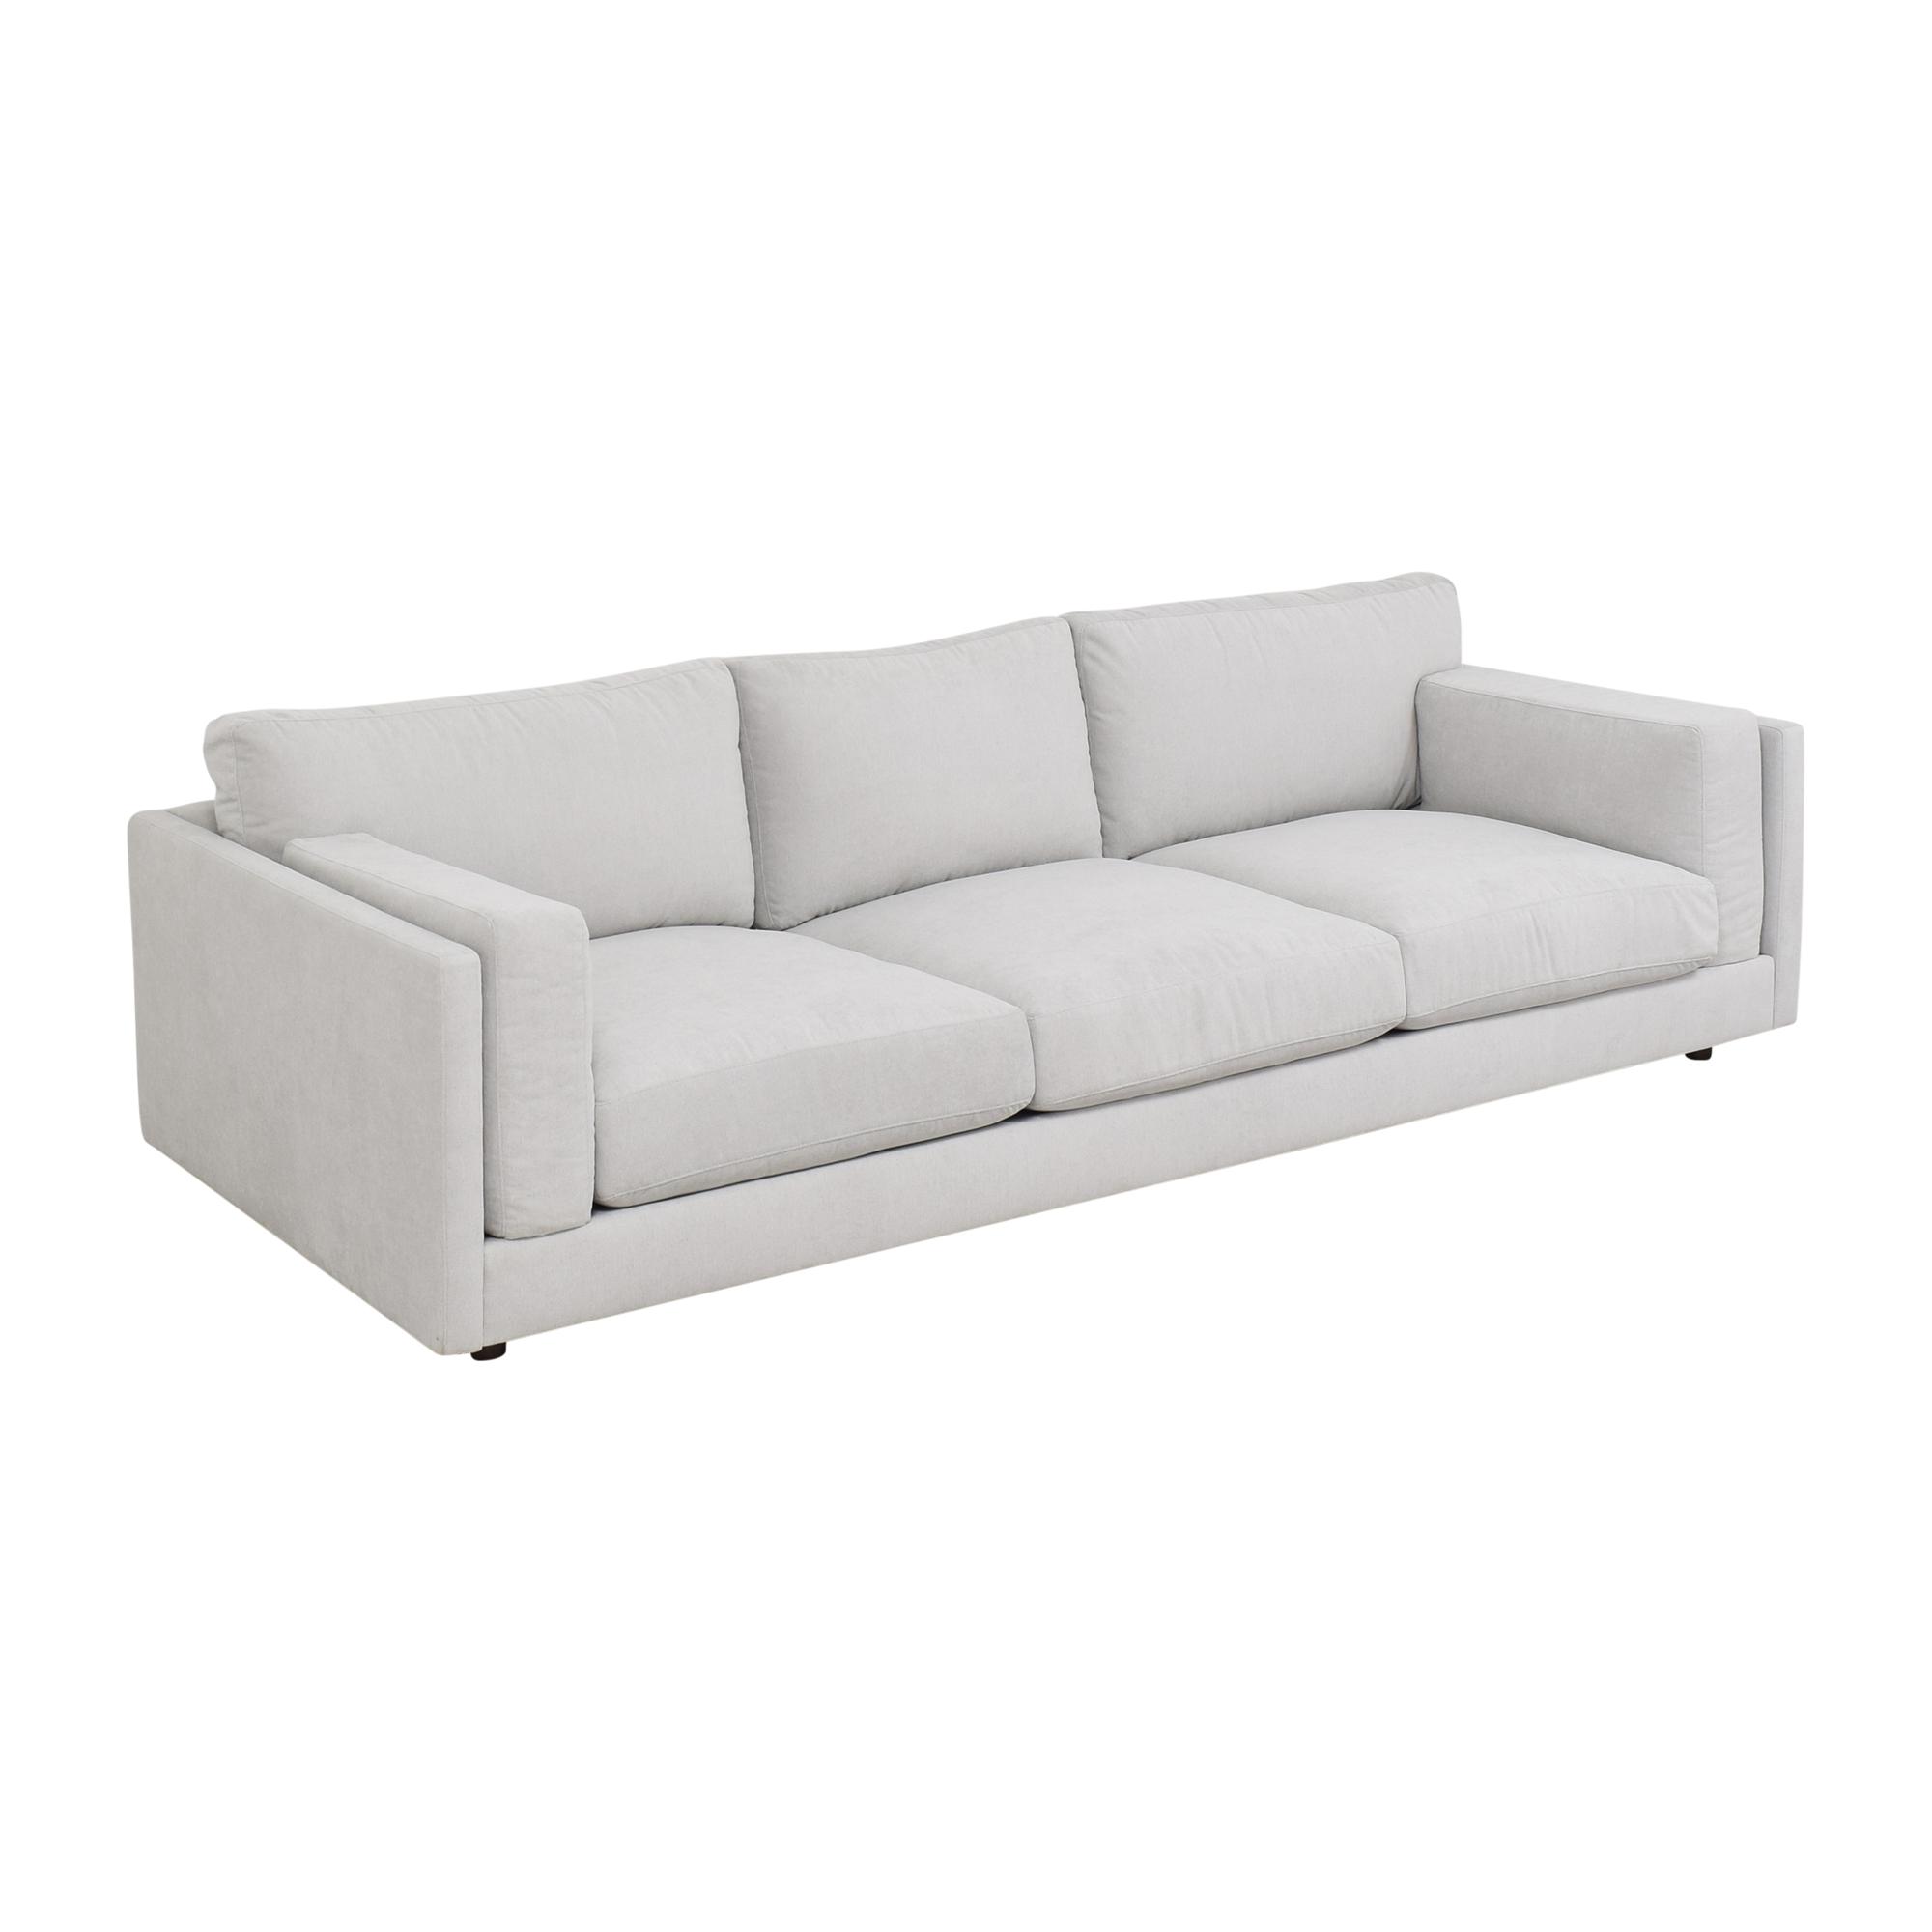 BenchMade Modern BenchMade Modern Skinny Fat Sofa coupon